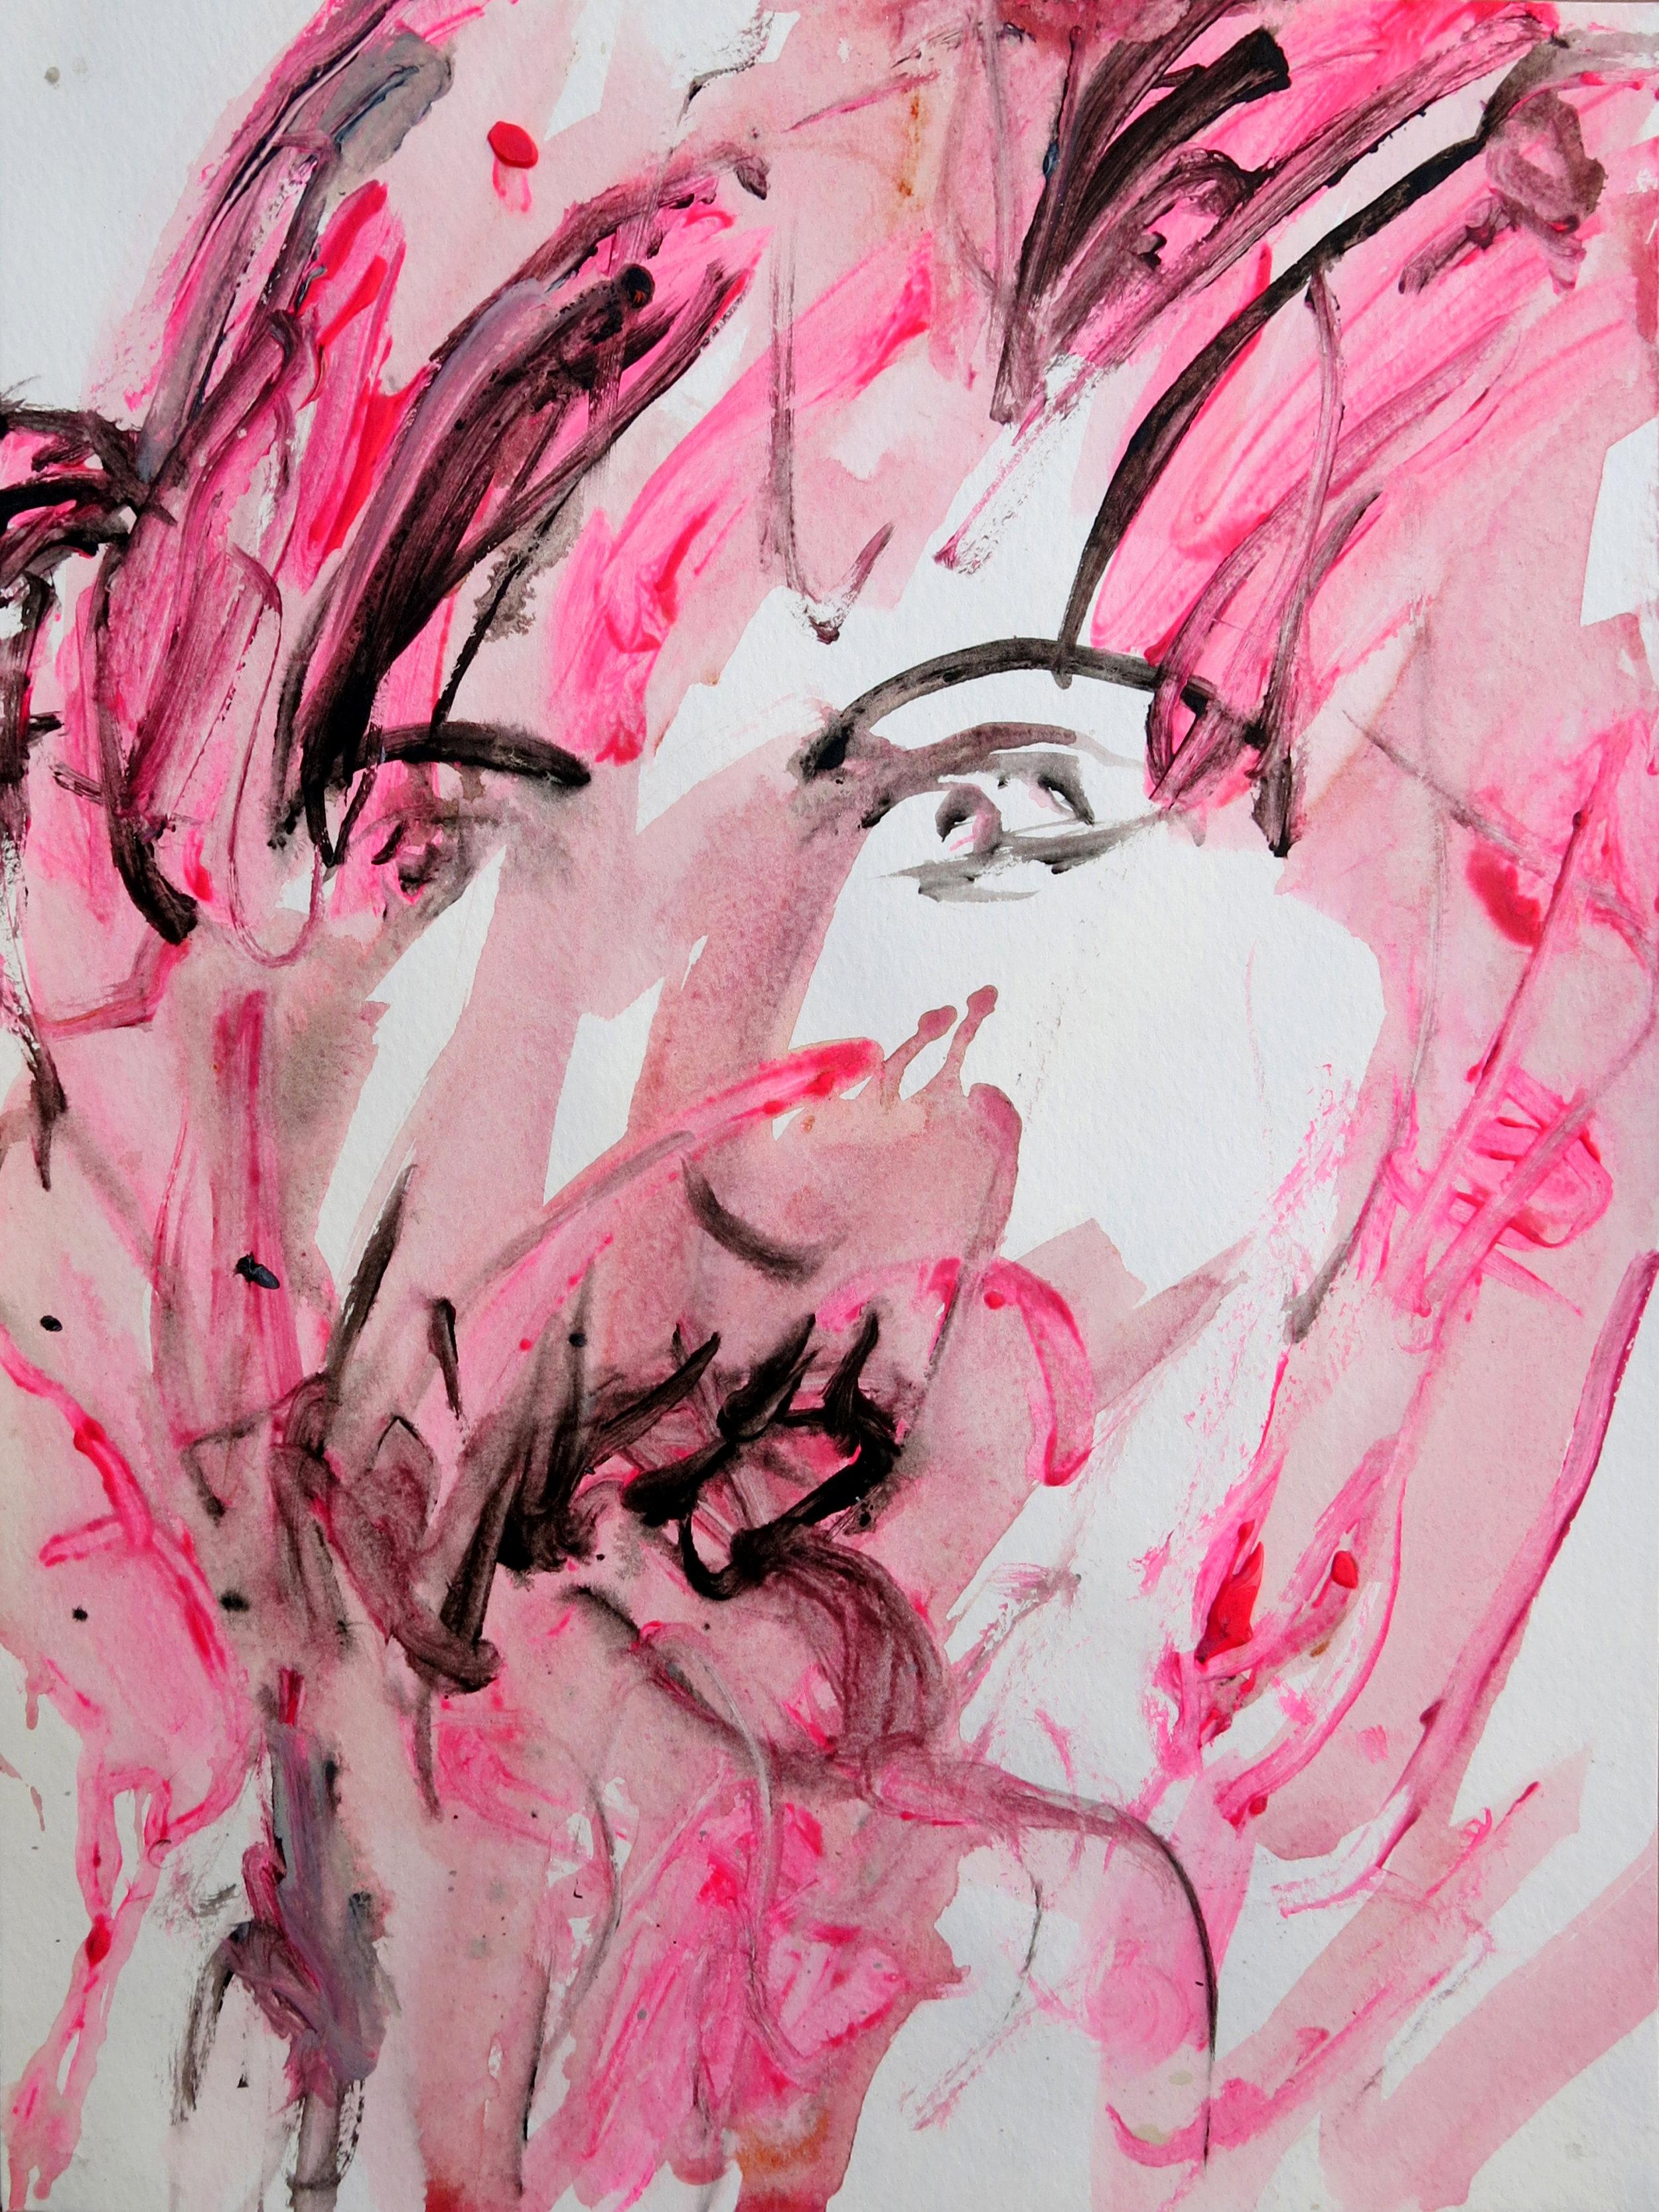 Barbra Streisand Portrait #168